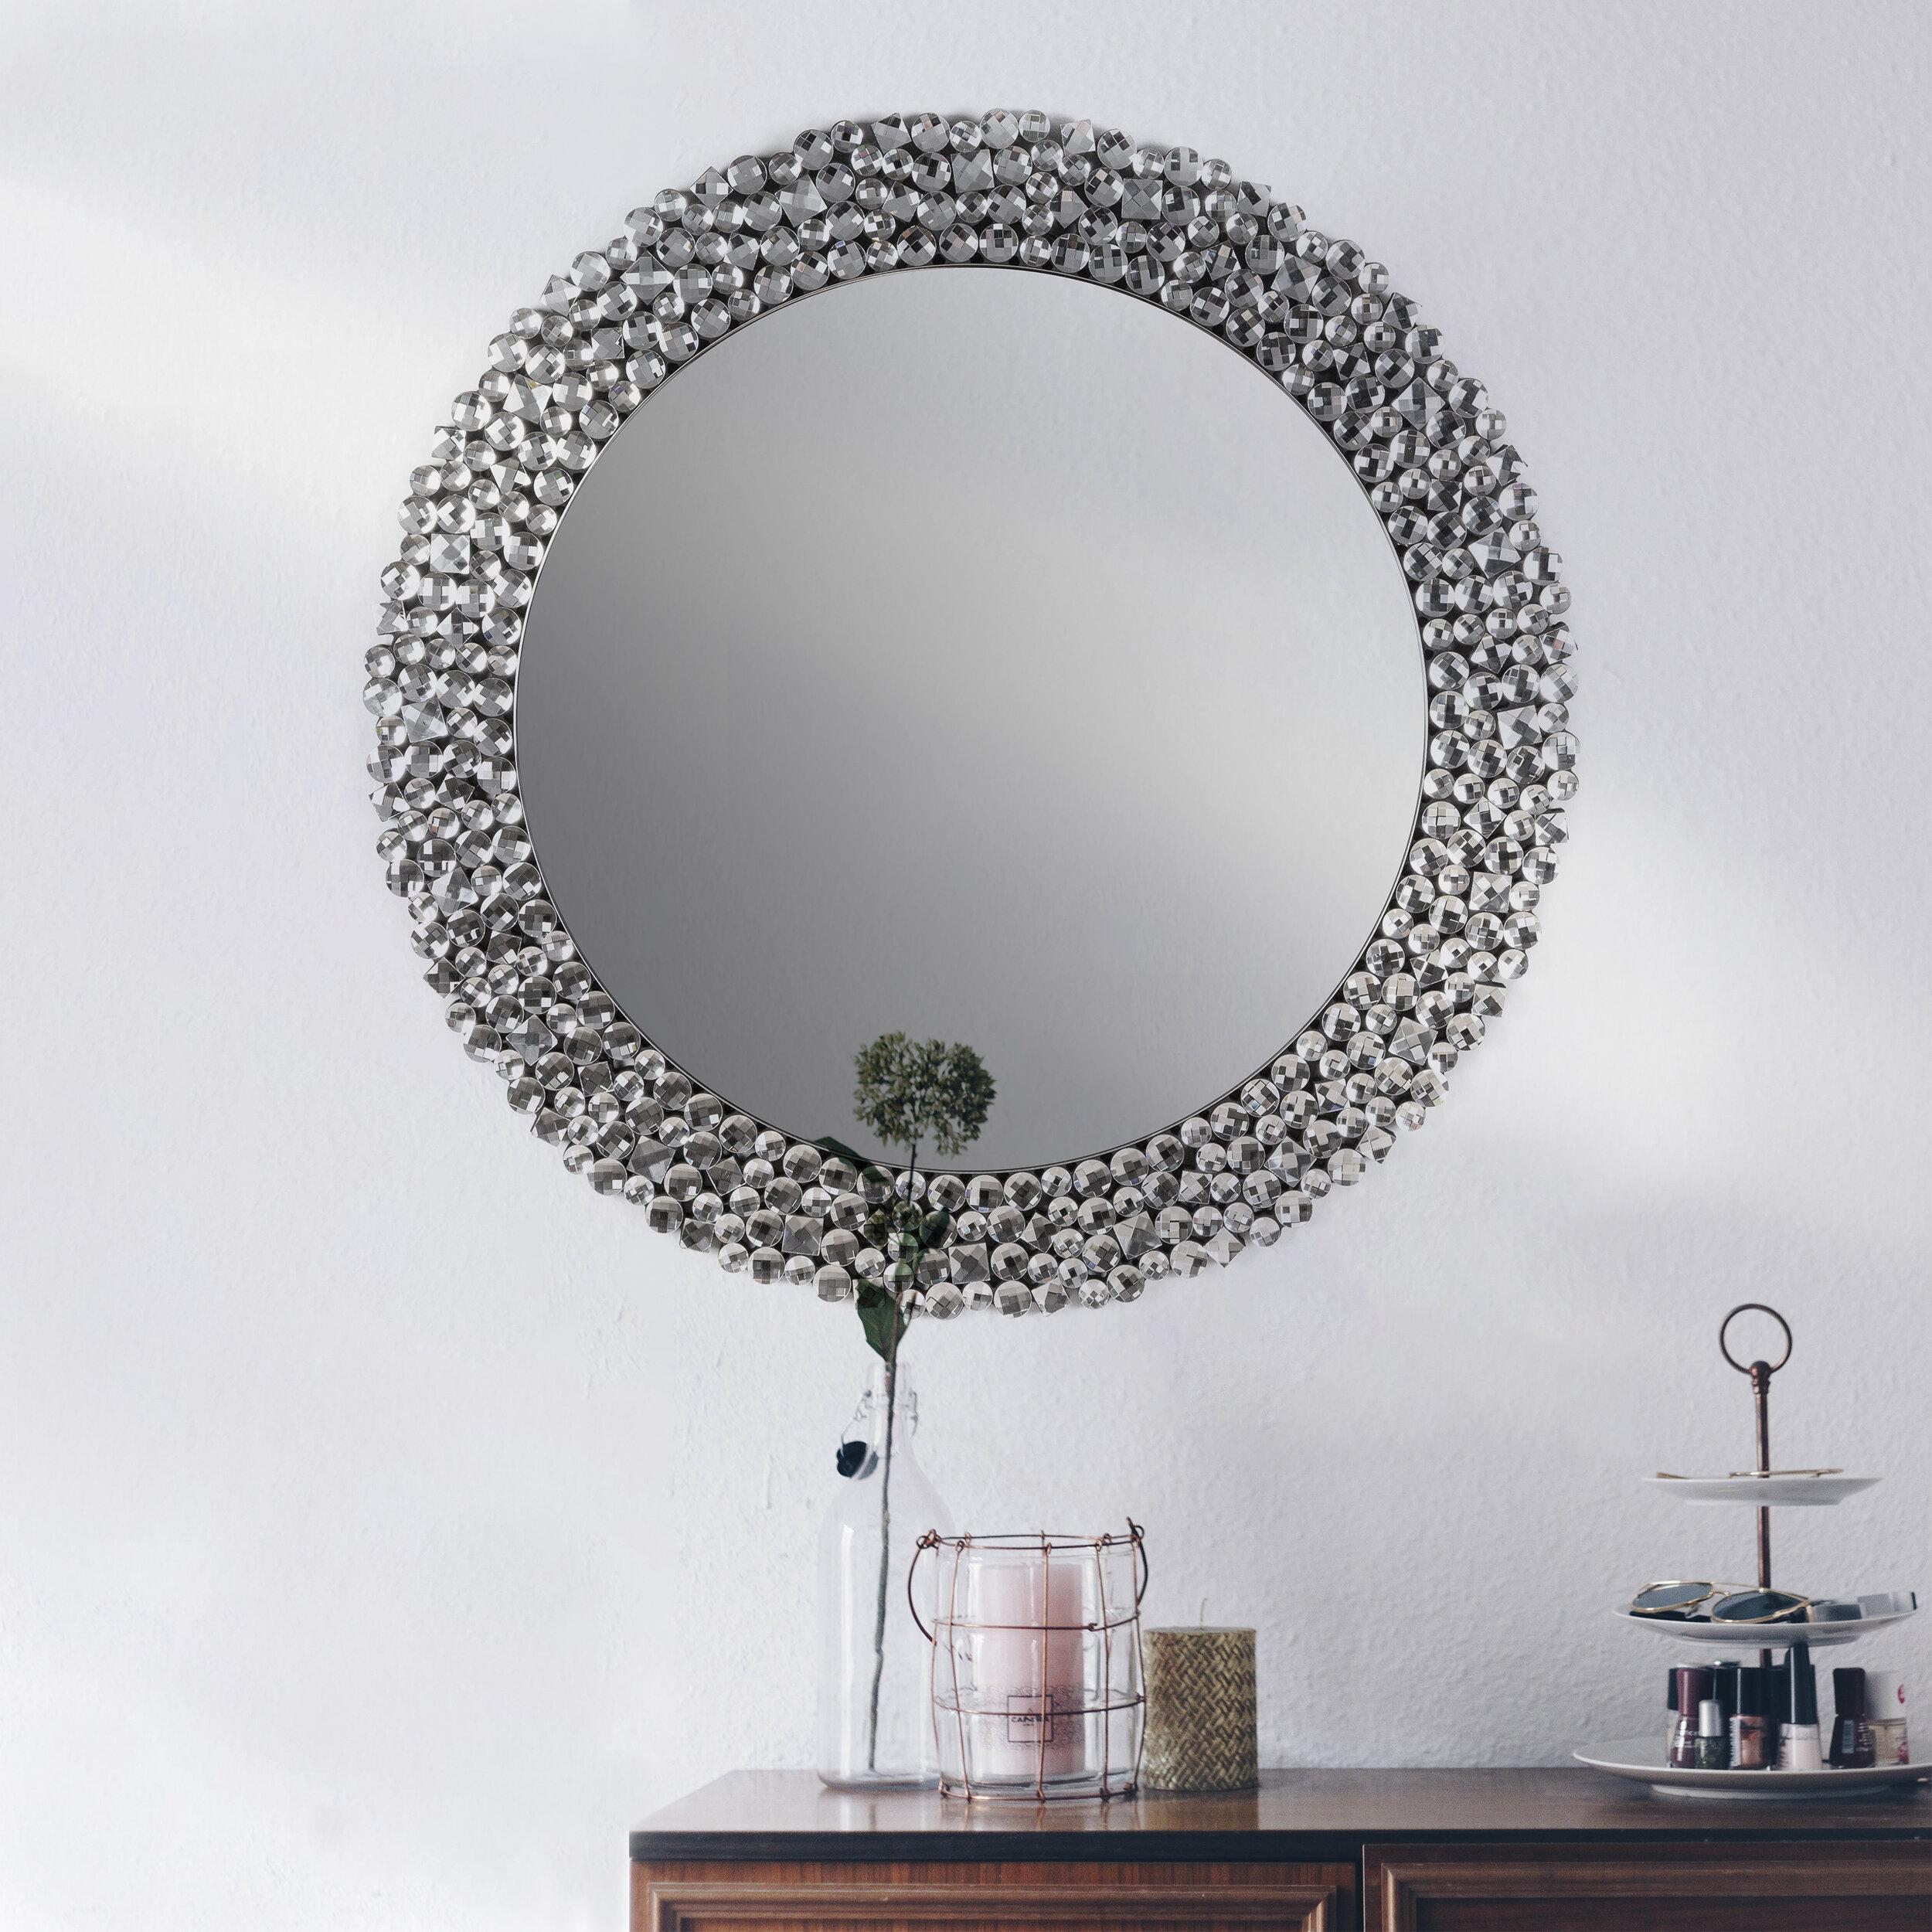 Pedigo Beveled Venetian Wall Mirror Pertaining To Point Reyes Molten Round Wall Mirrors (Image 9 of 20)